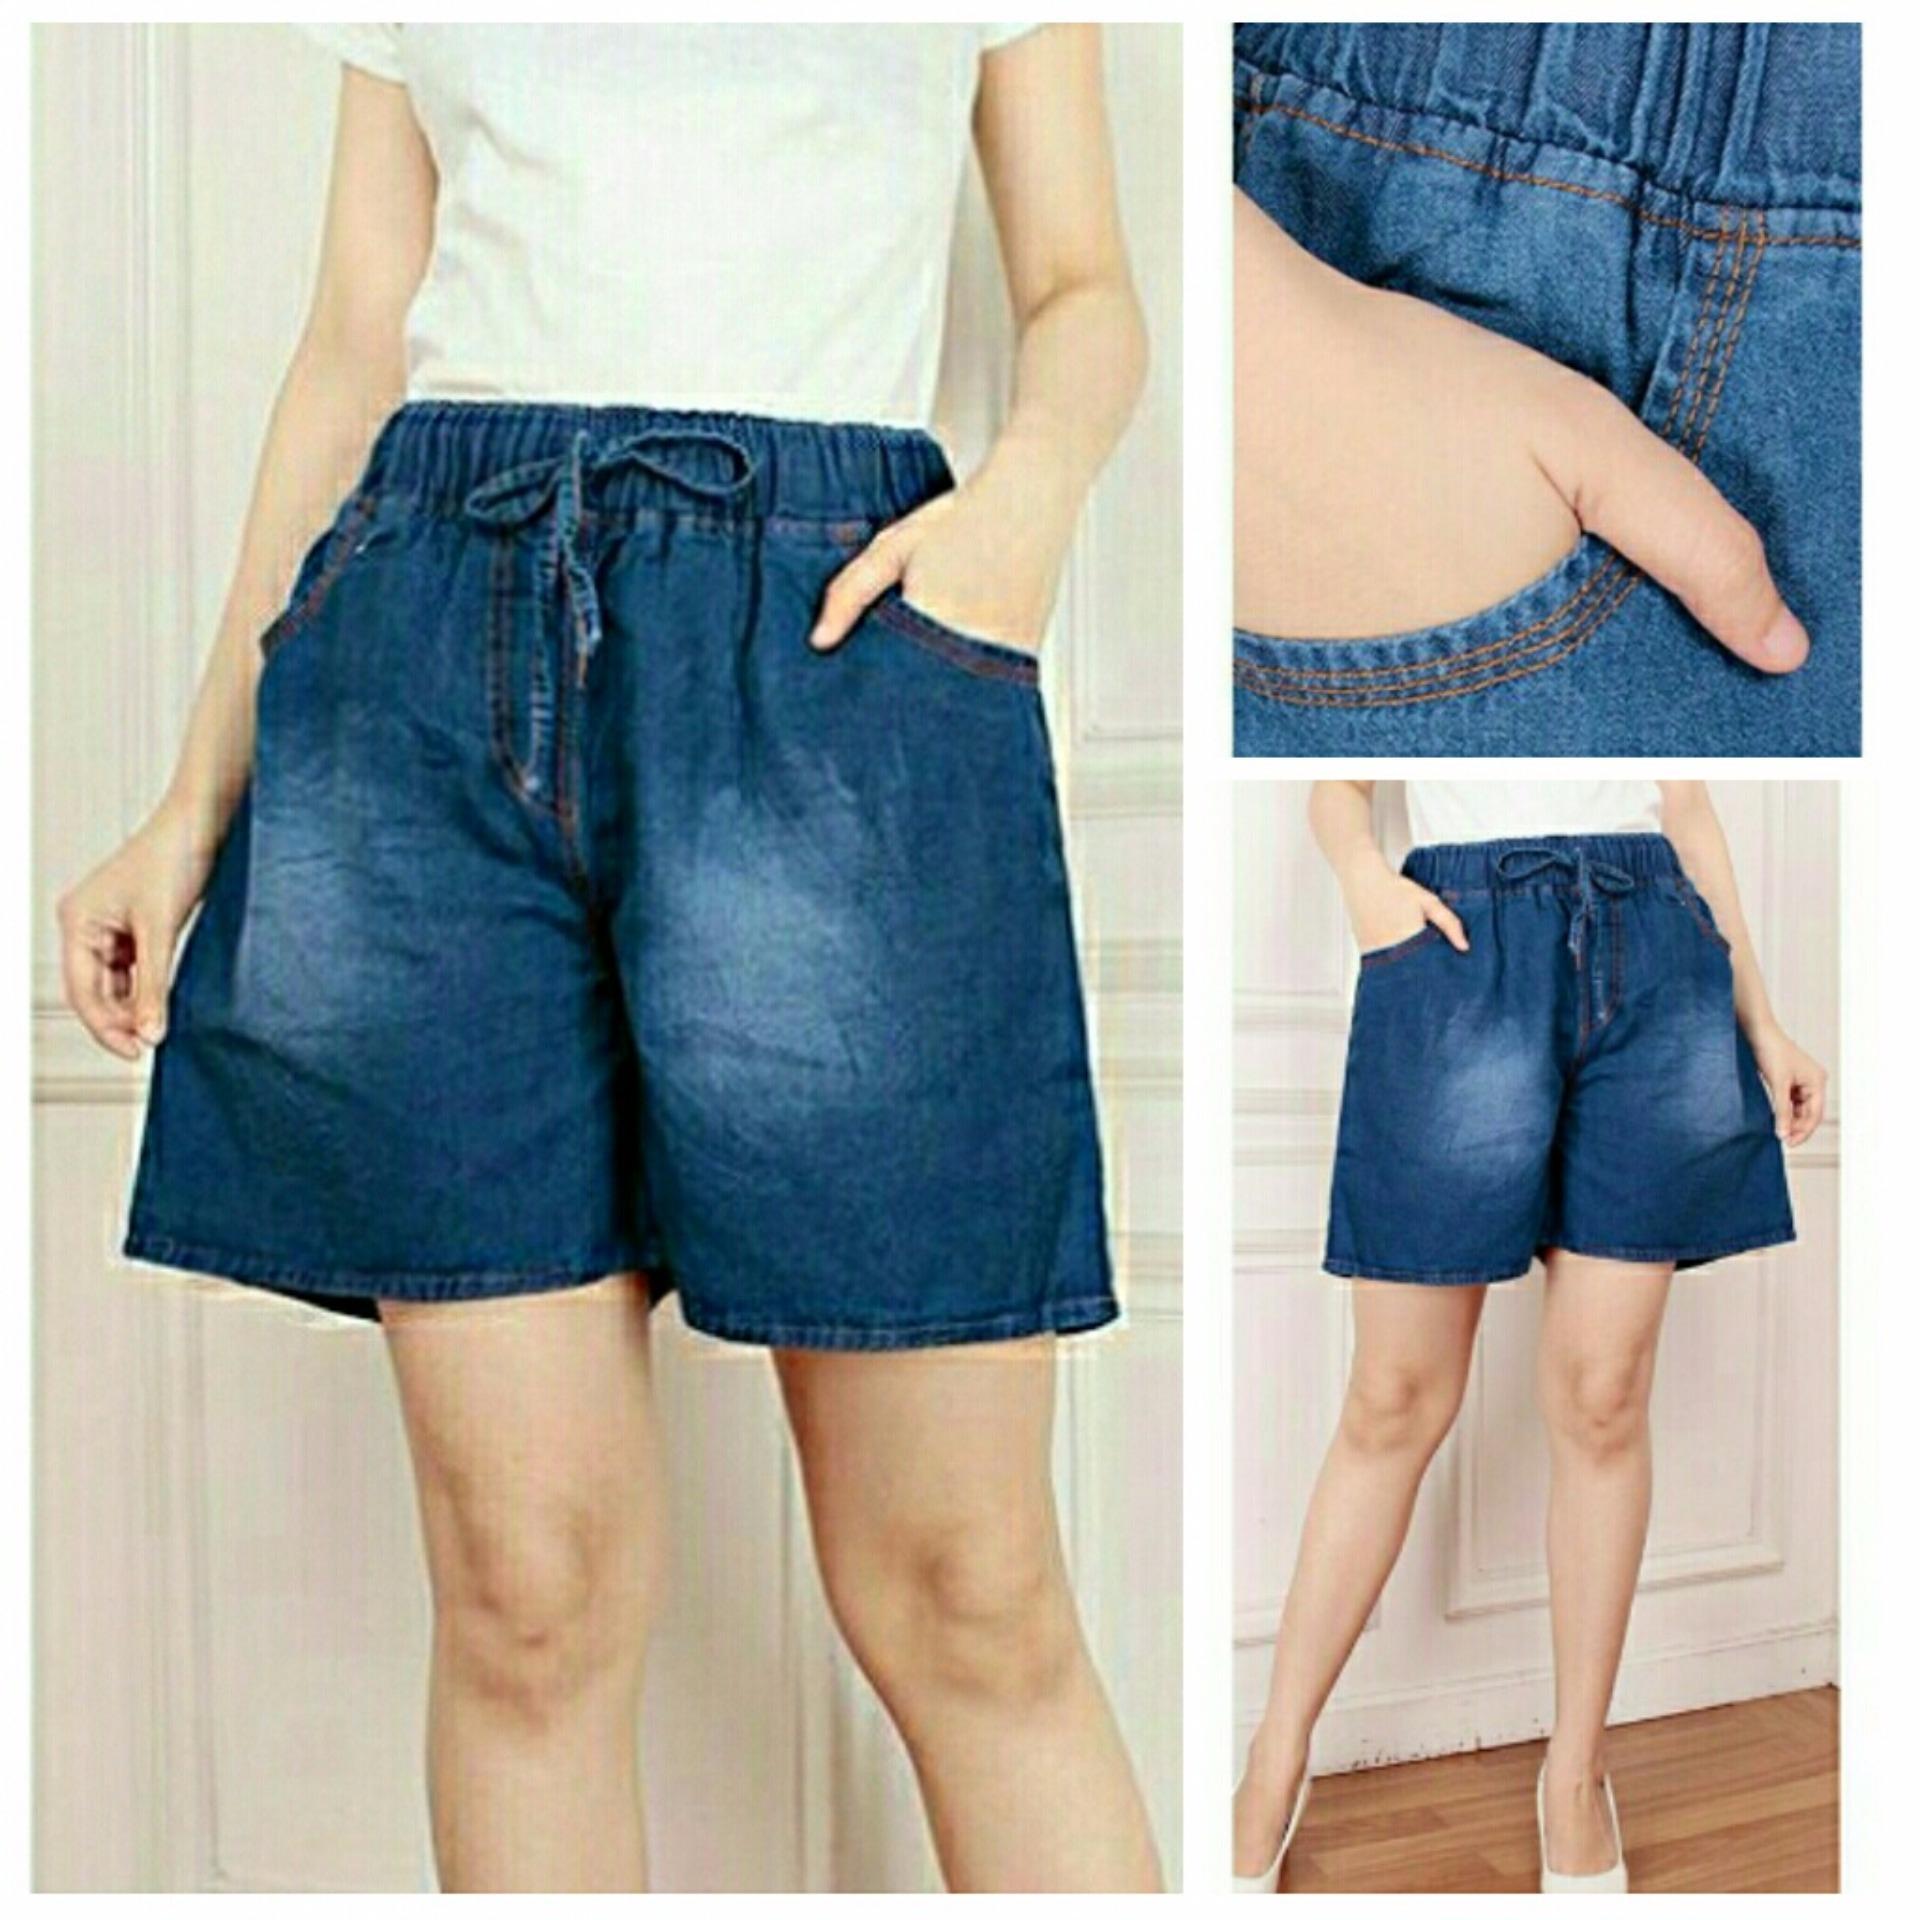 Cj collection Celana jeans jumbo pendek hotpant wanita jumbo short pant Savita